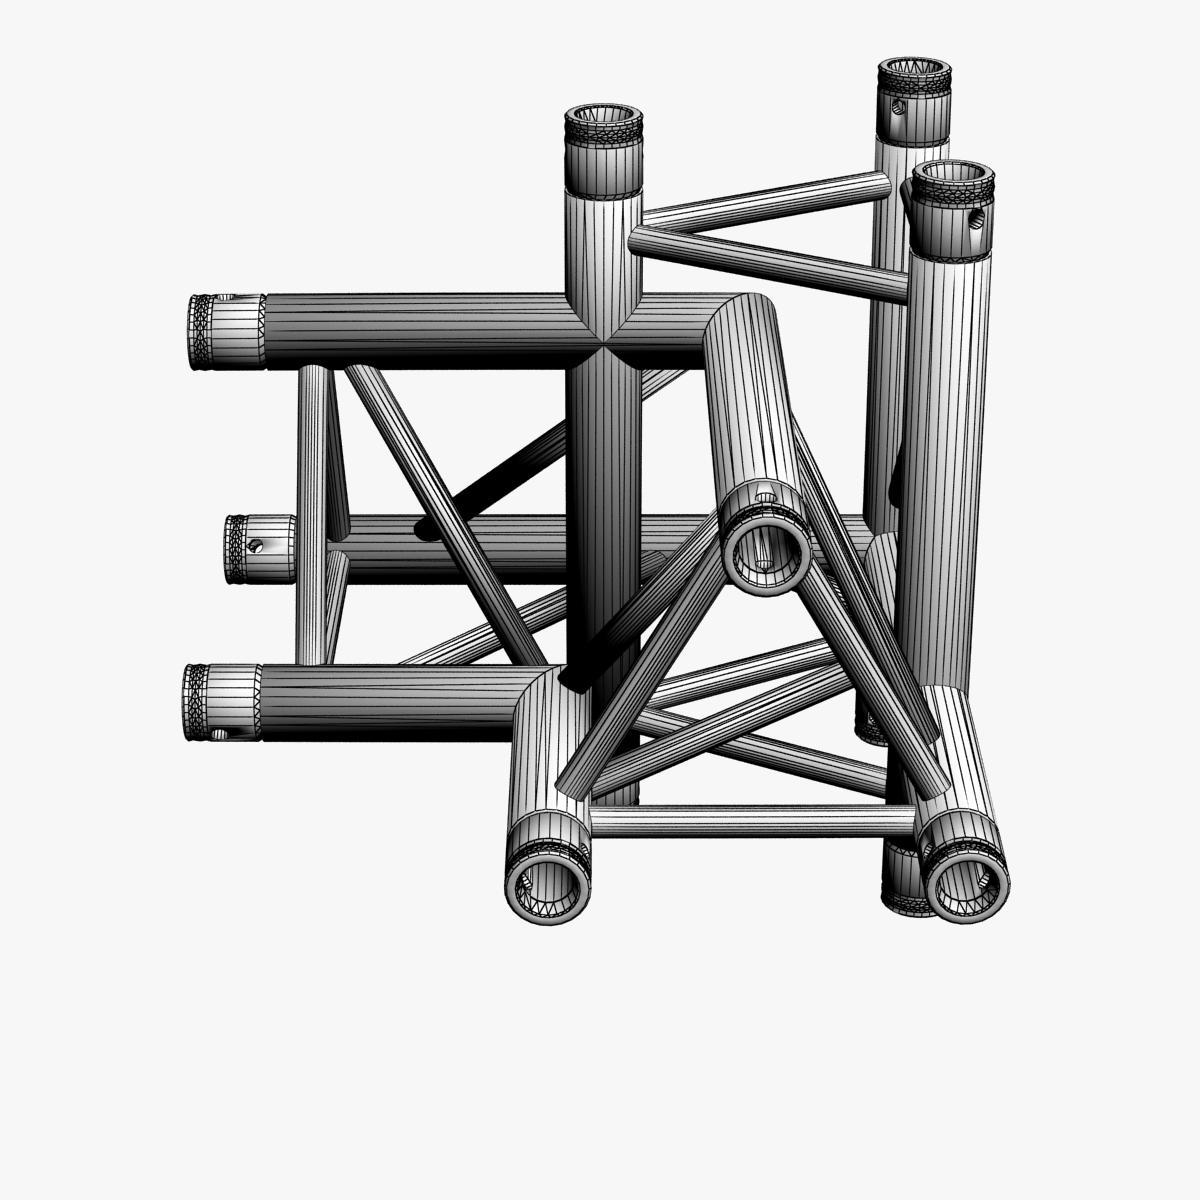 Triangular Truss Corner Junction 102 3d model 3ds max dxf fbx b3d c4d  obj other 268935